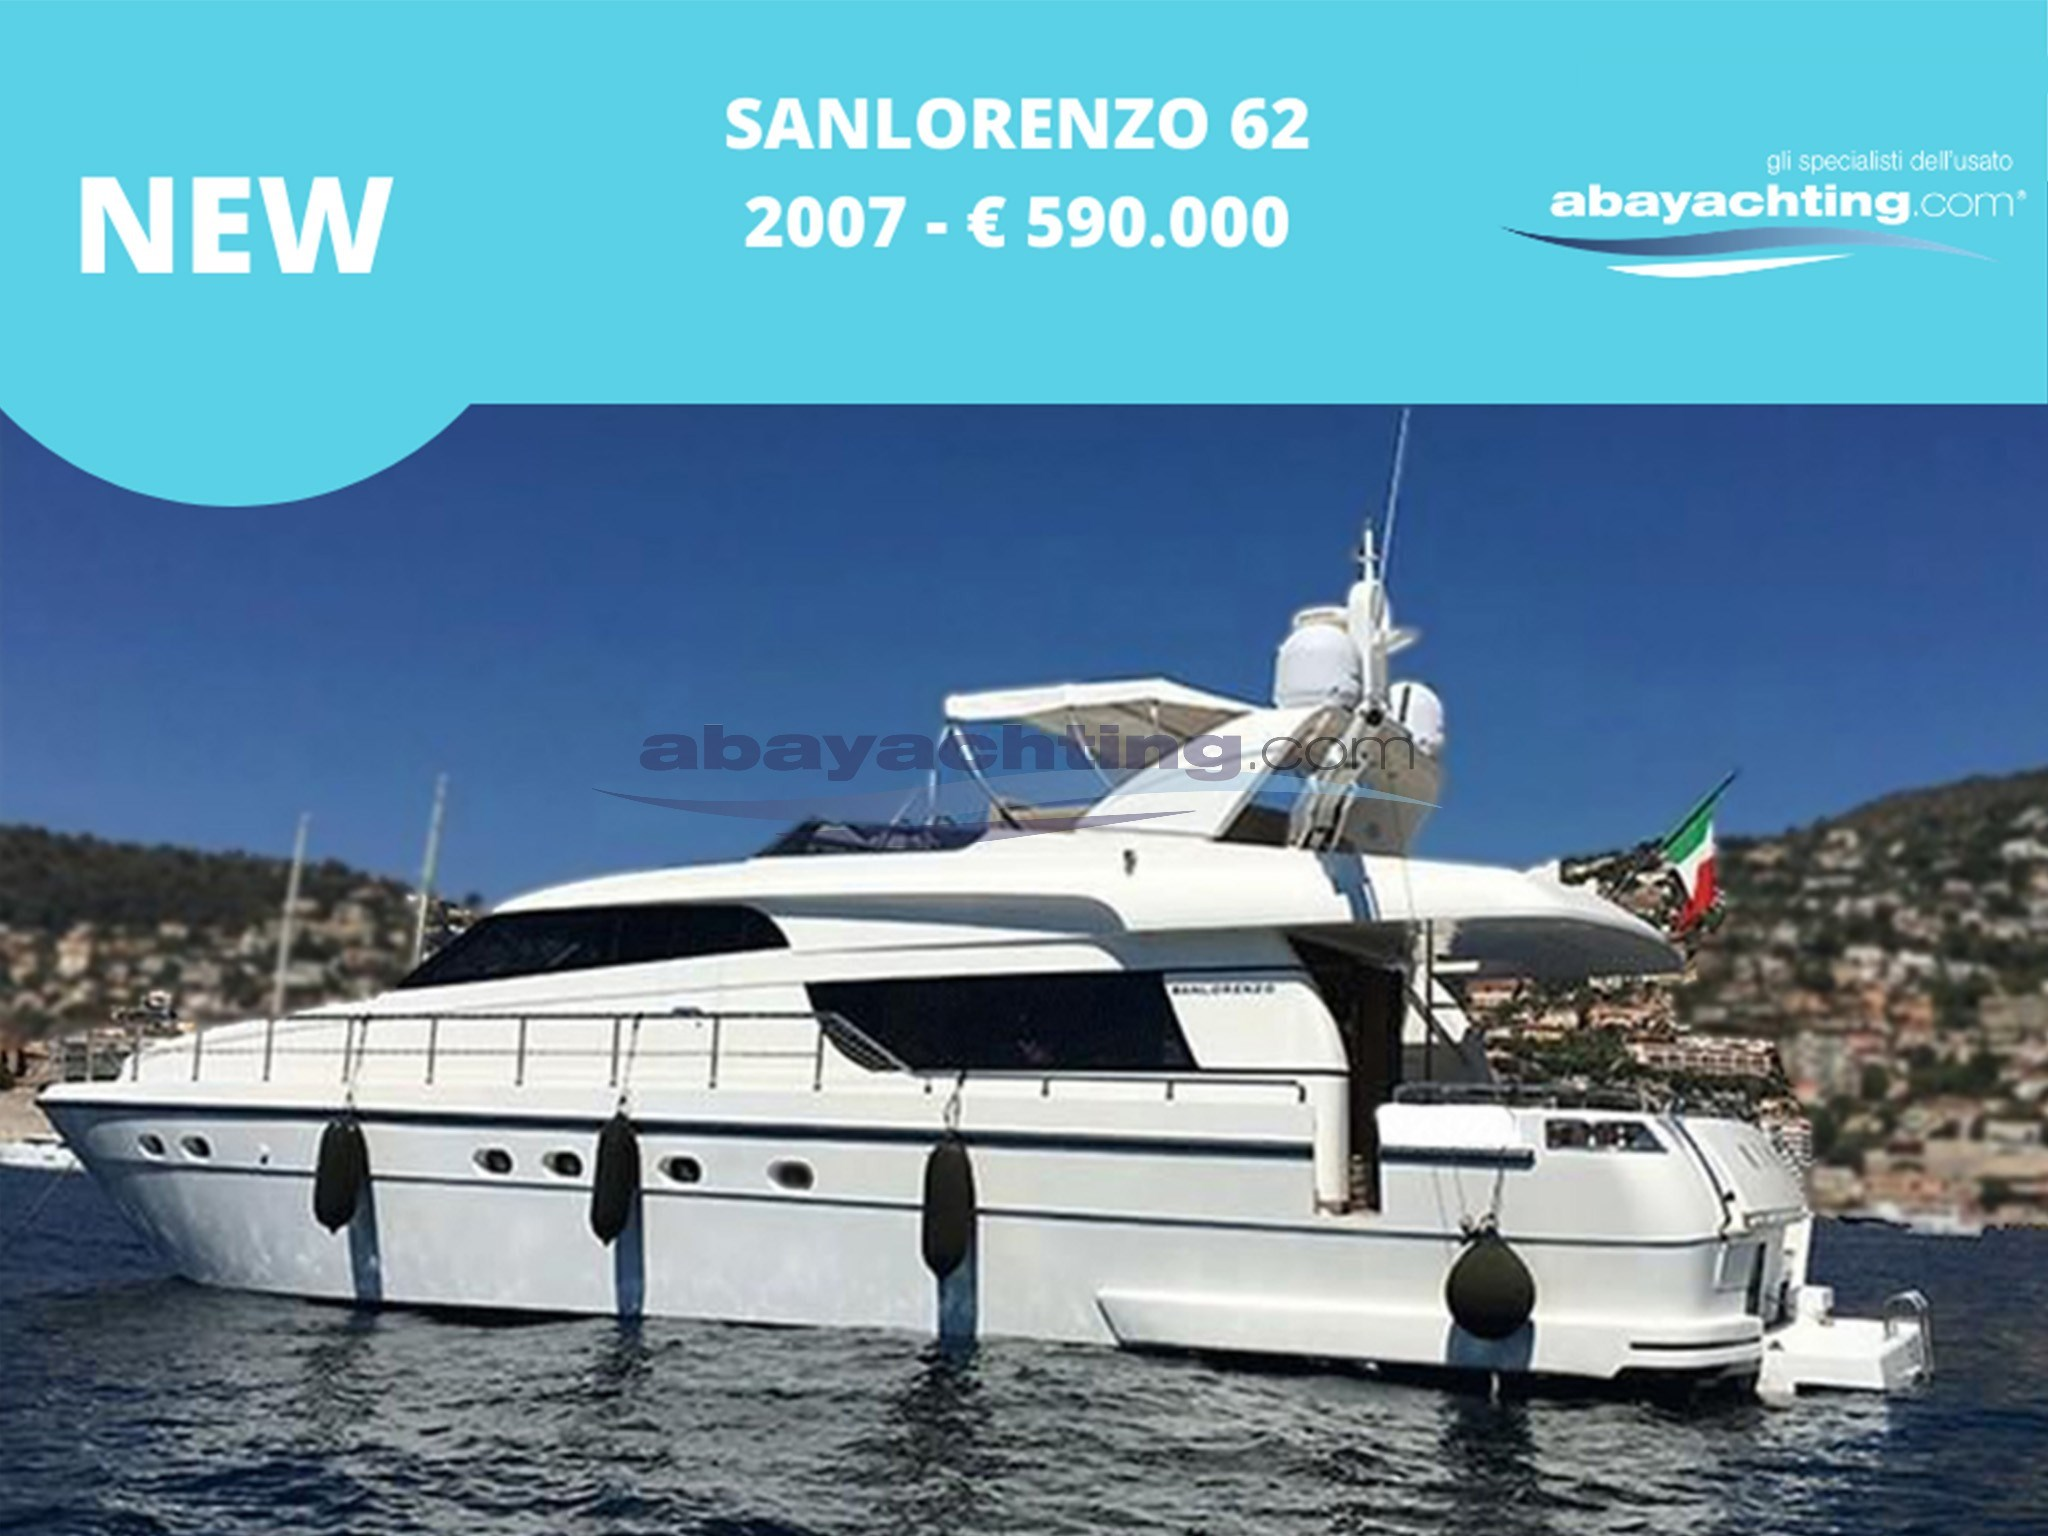 New arrival Sanlorenzo 62